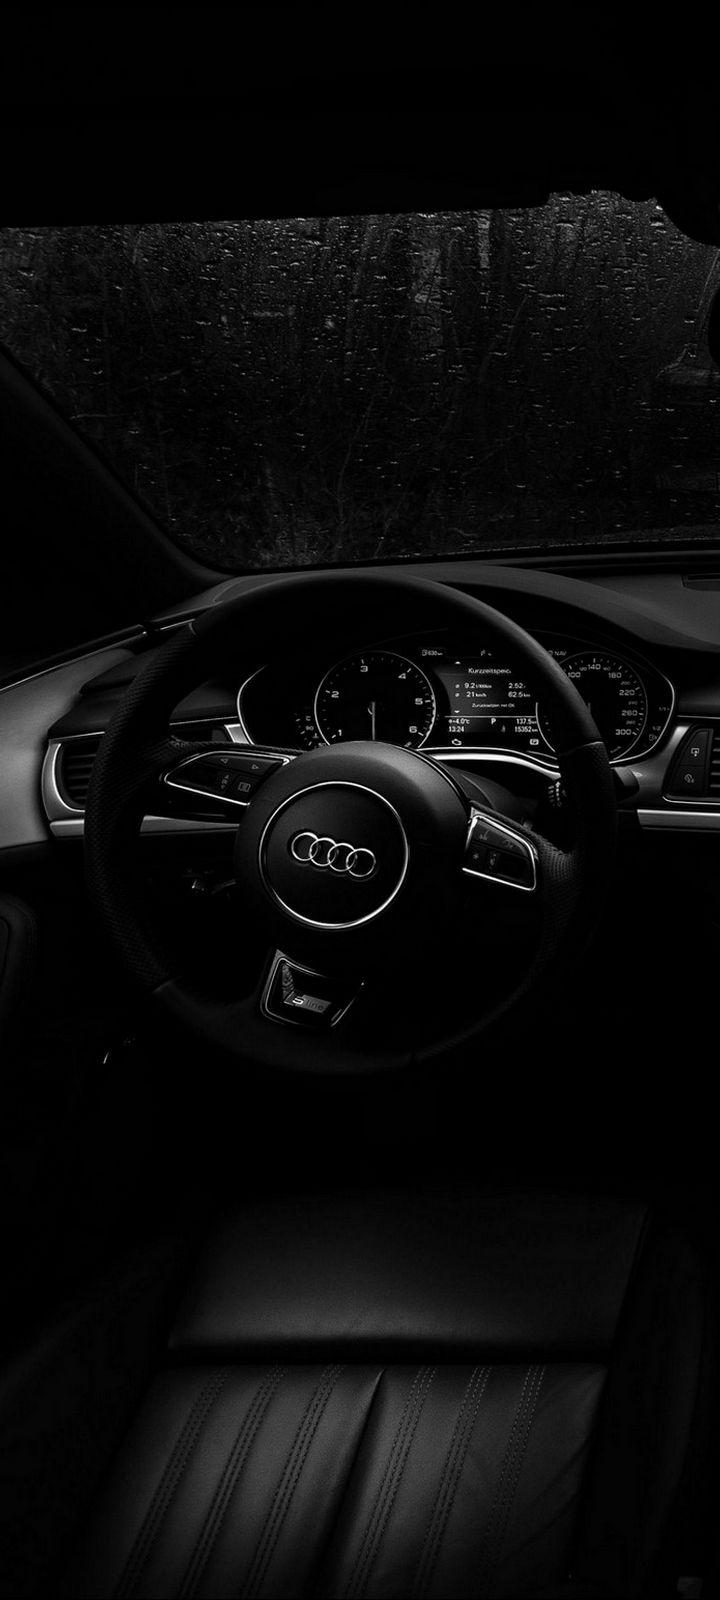 Audi Steering Wheel Wallpaper 720x1600